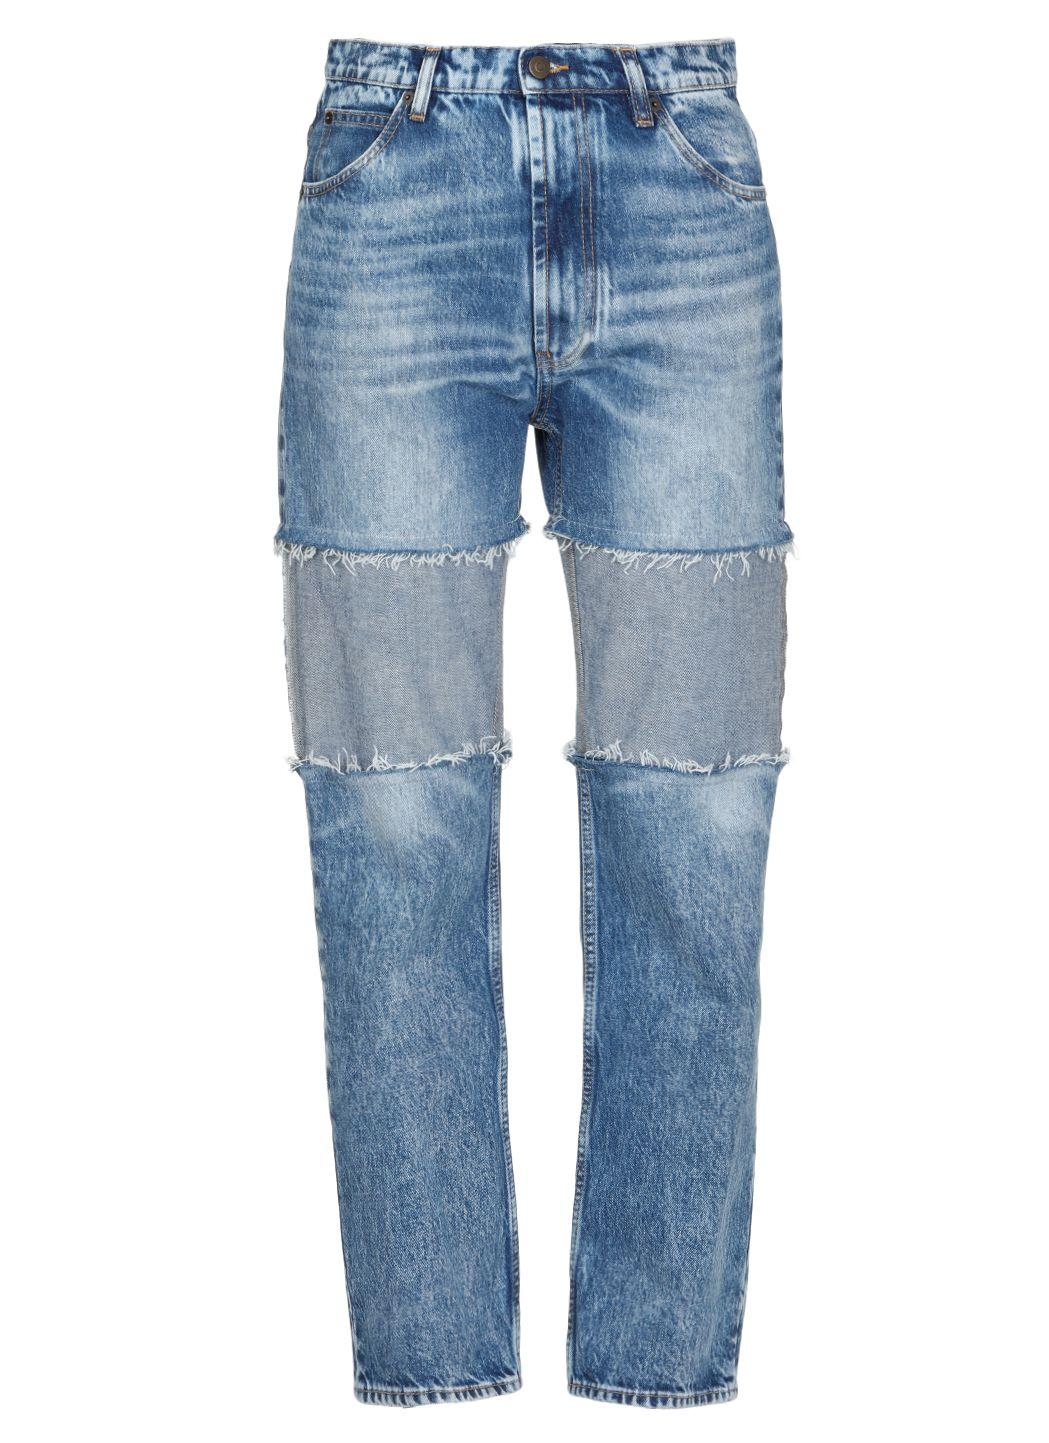 Recycled denim Spliced jeans